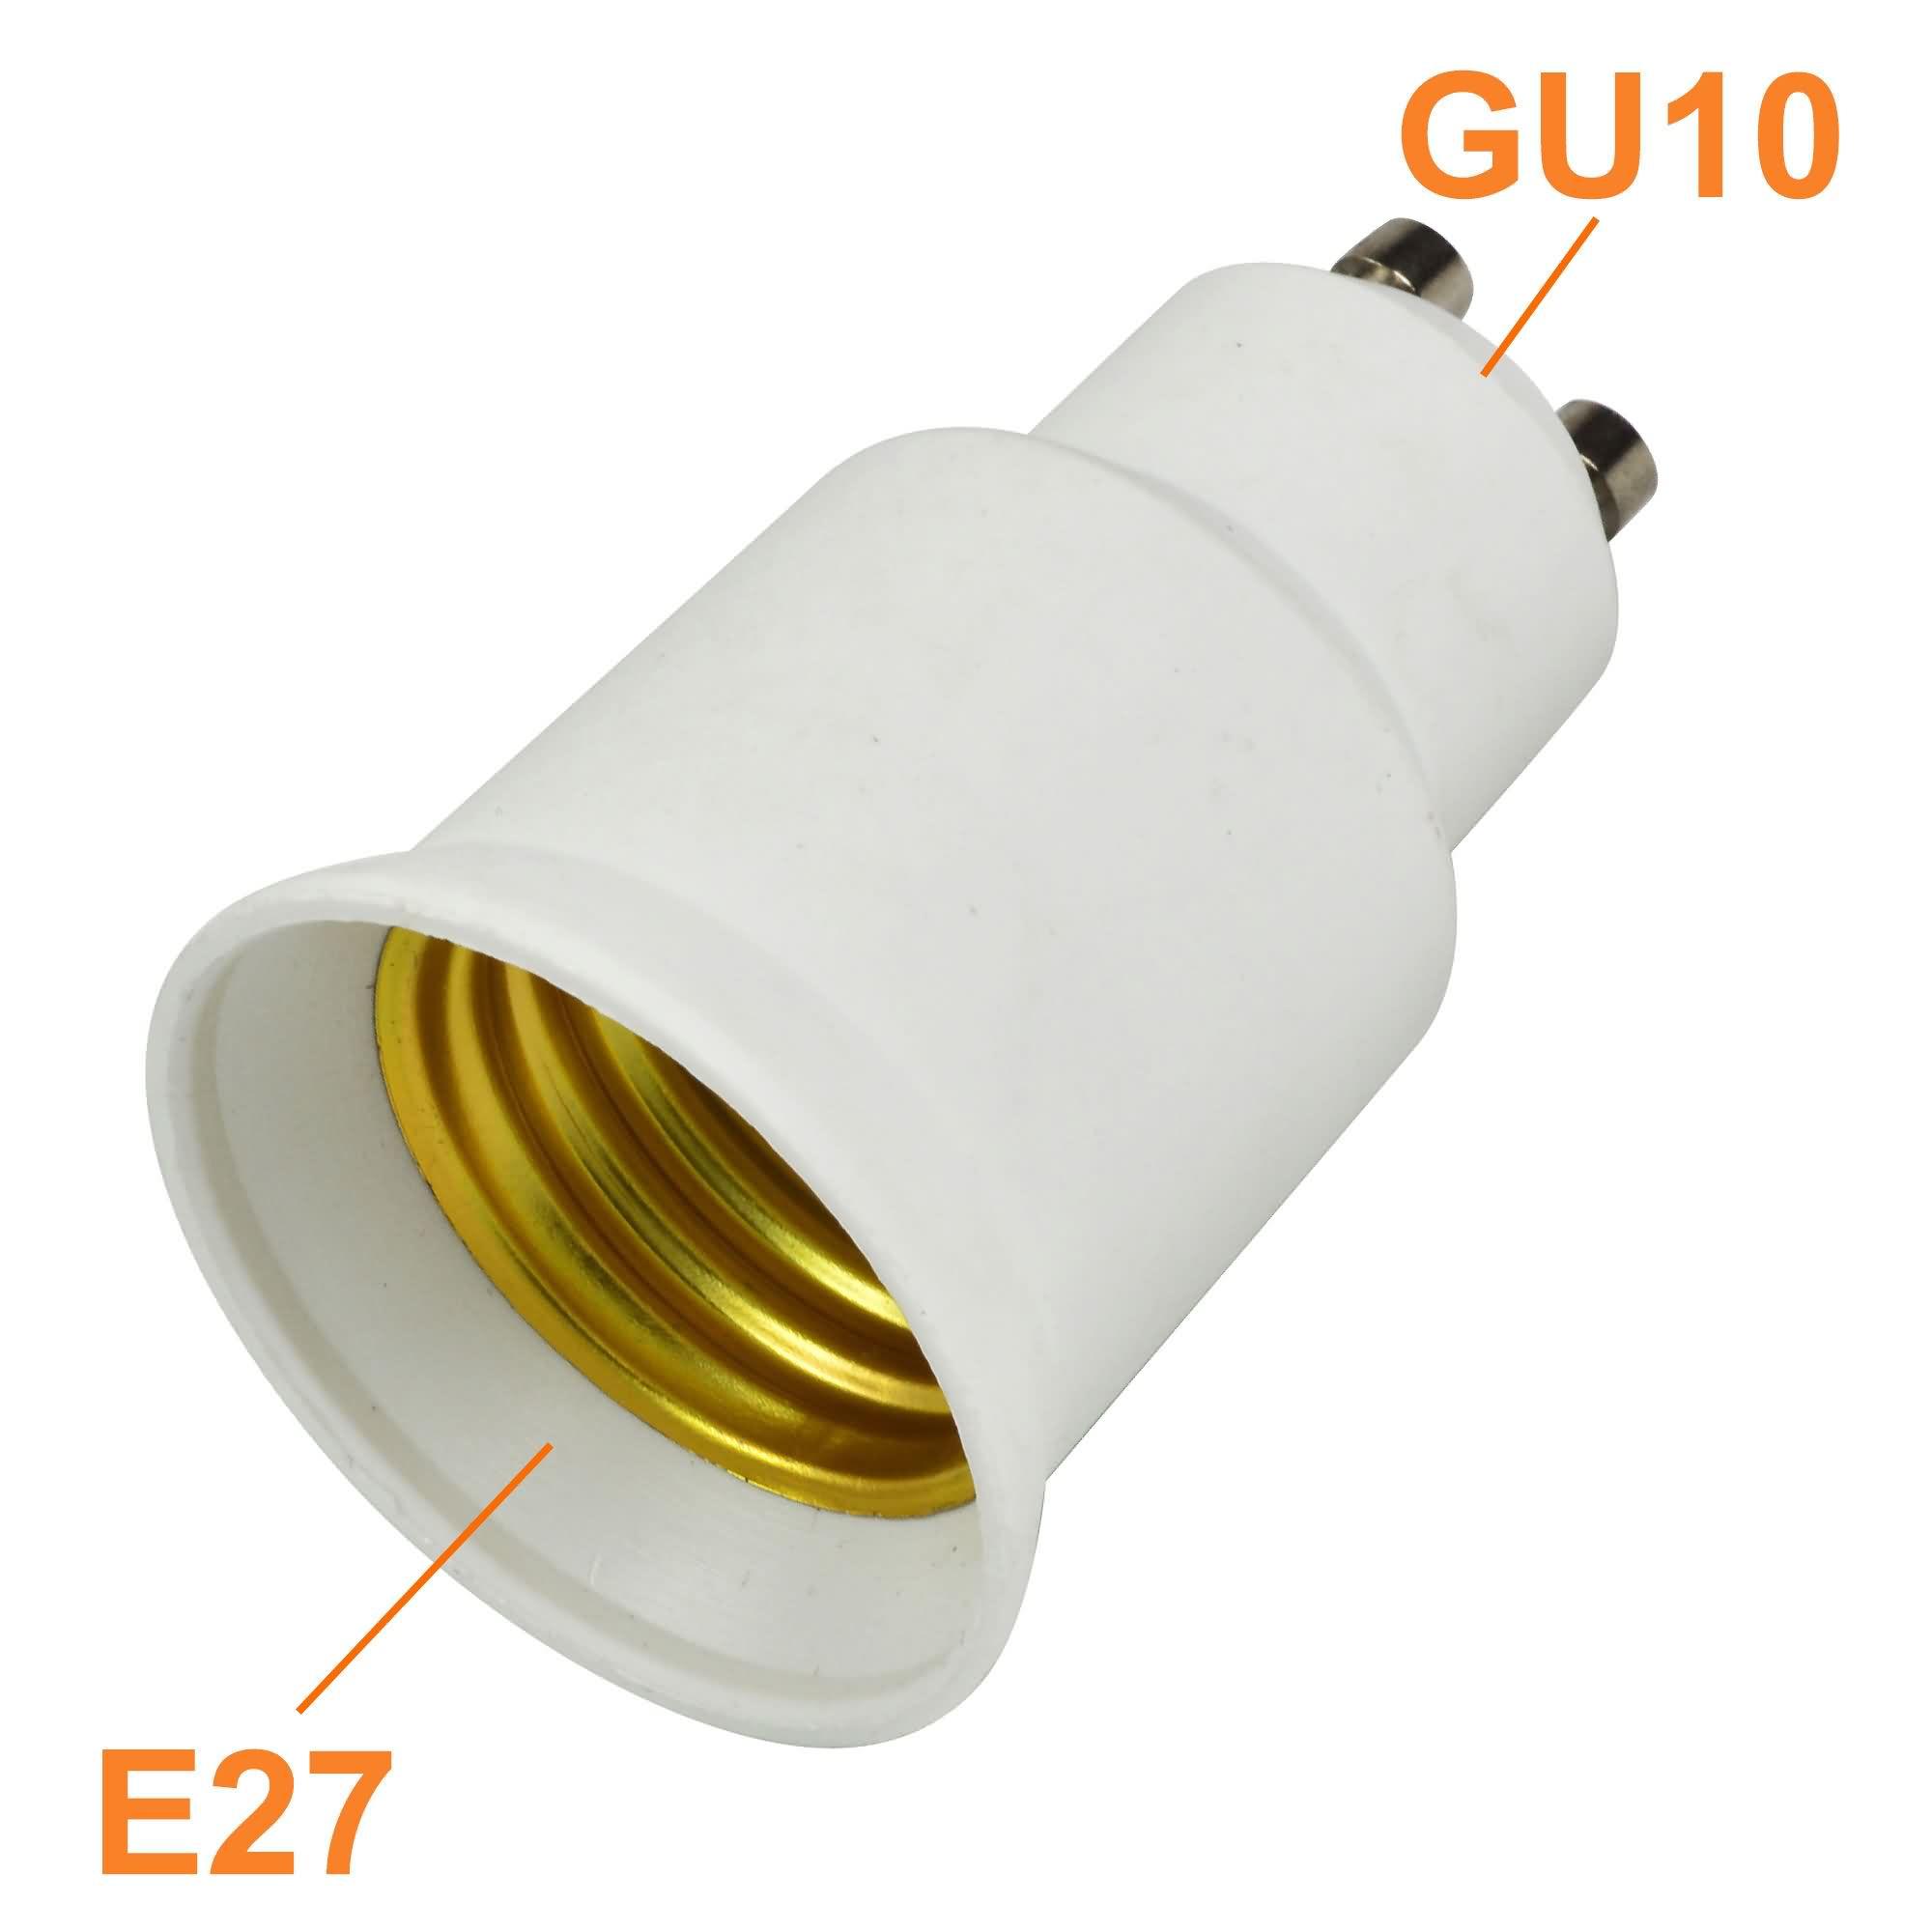 Gu10 Base: MENGS® High Quality Lamp Base Adapter GU10 To